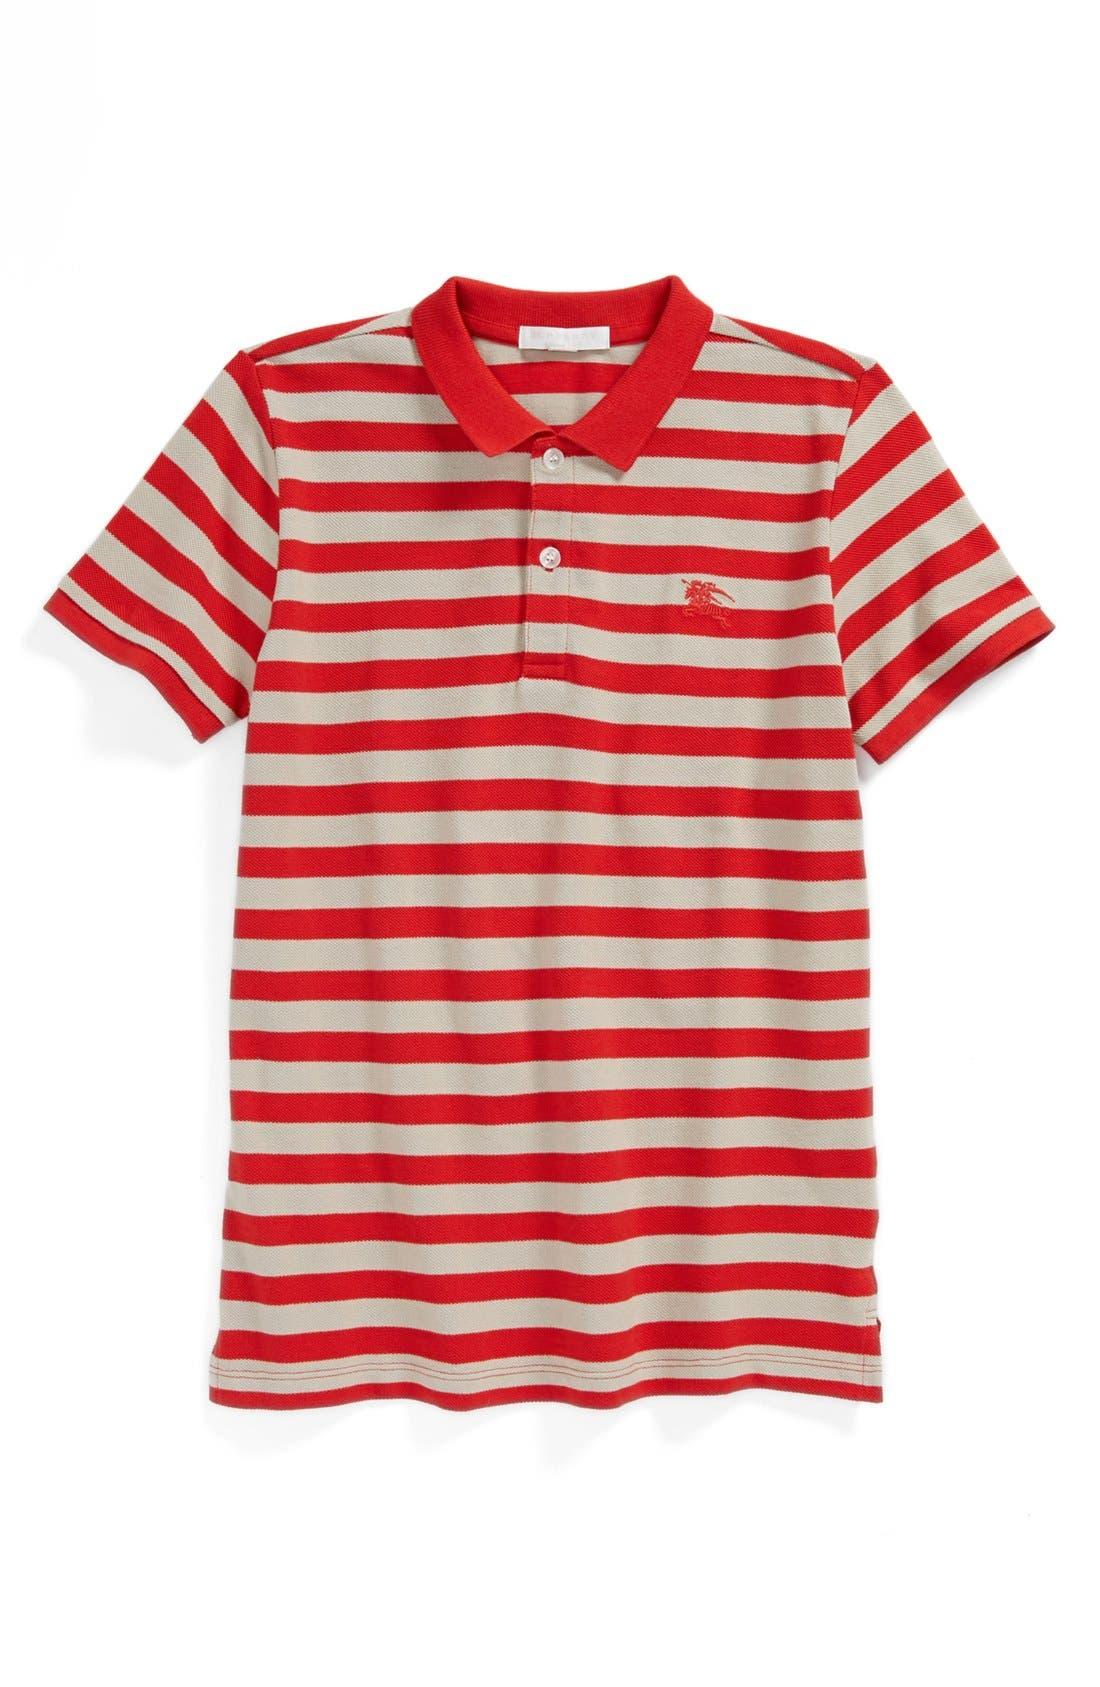 Alternate Image 1 Selected - Burberry Stripe Cotton Polo (Toddler Boys)